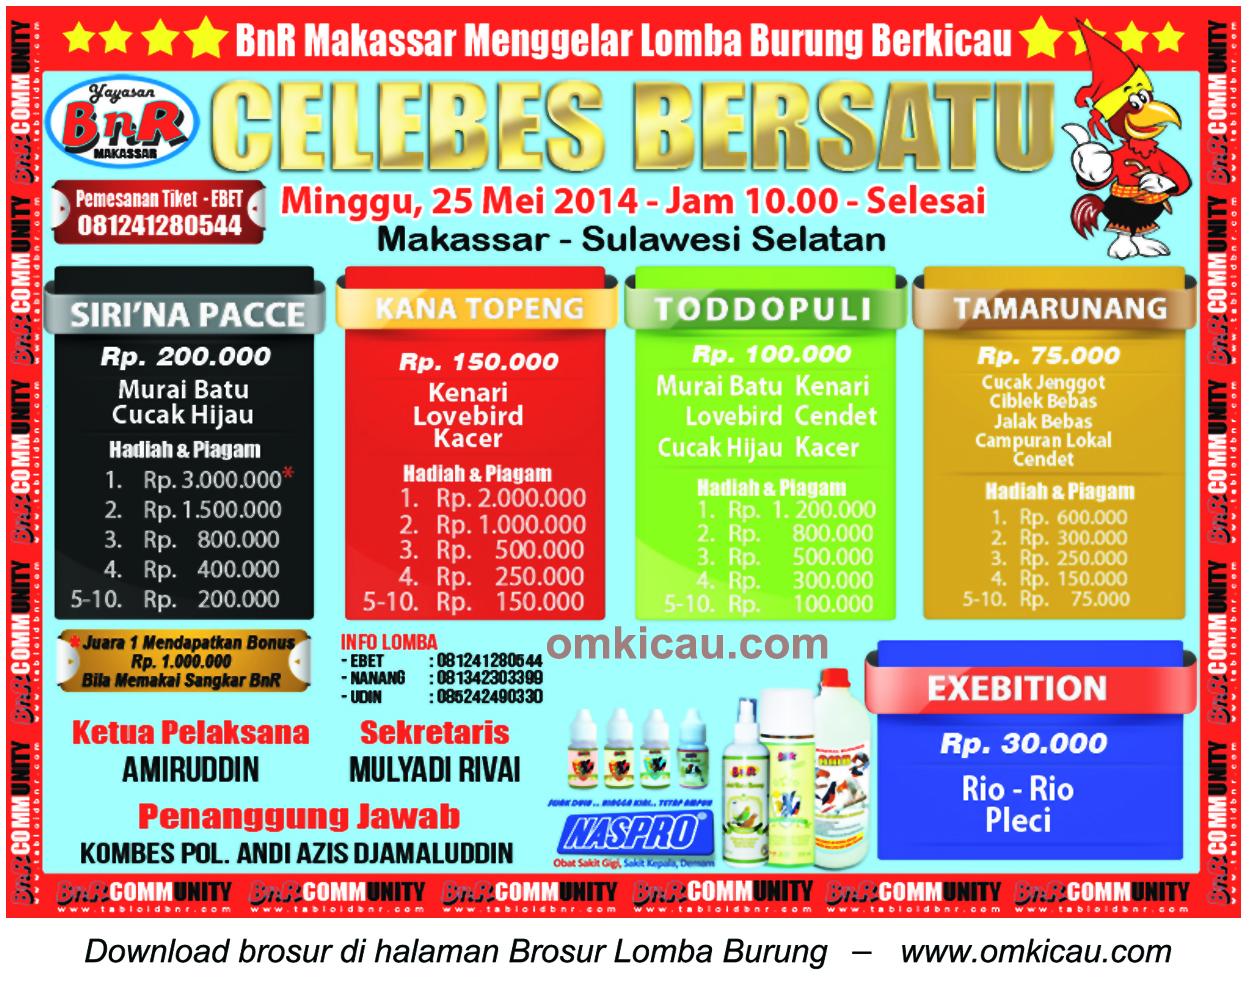 Brosur Lomba Burung Berkicau Celebes Bersatu, Makassar, 25 Mei 2014